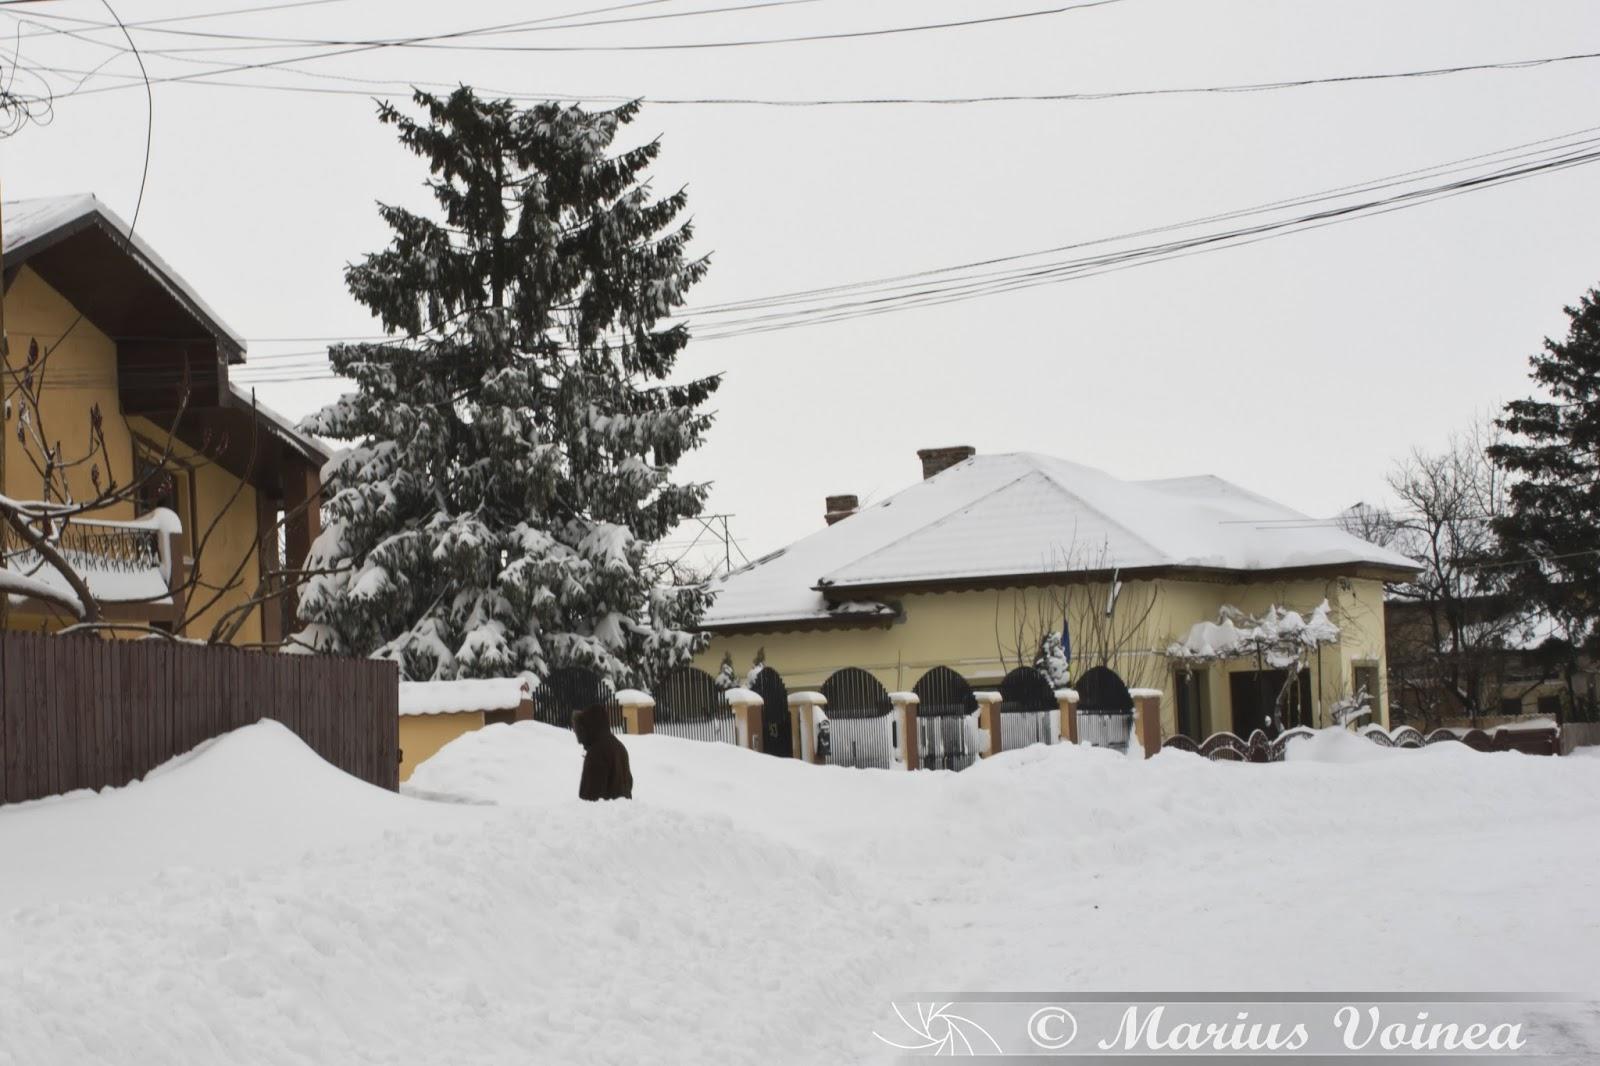 iarna la ramnicu sarat, 2014 foto 1